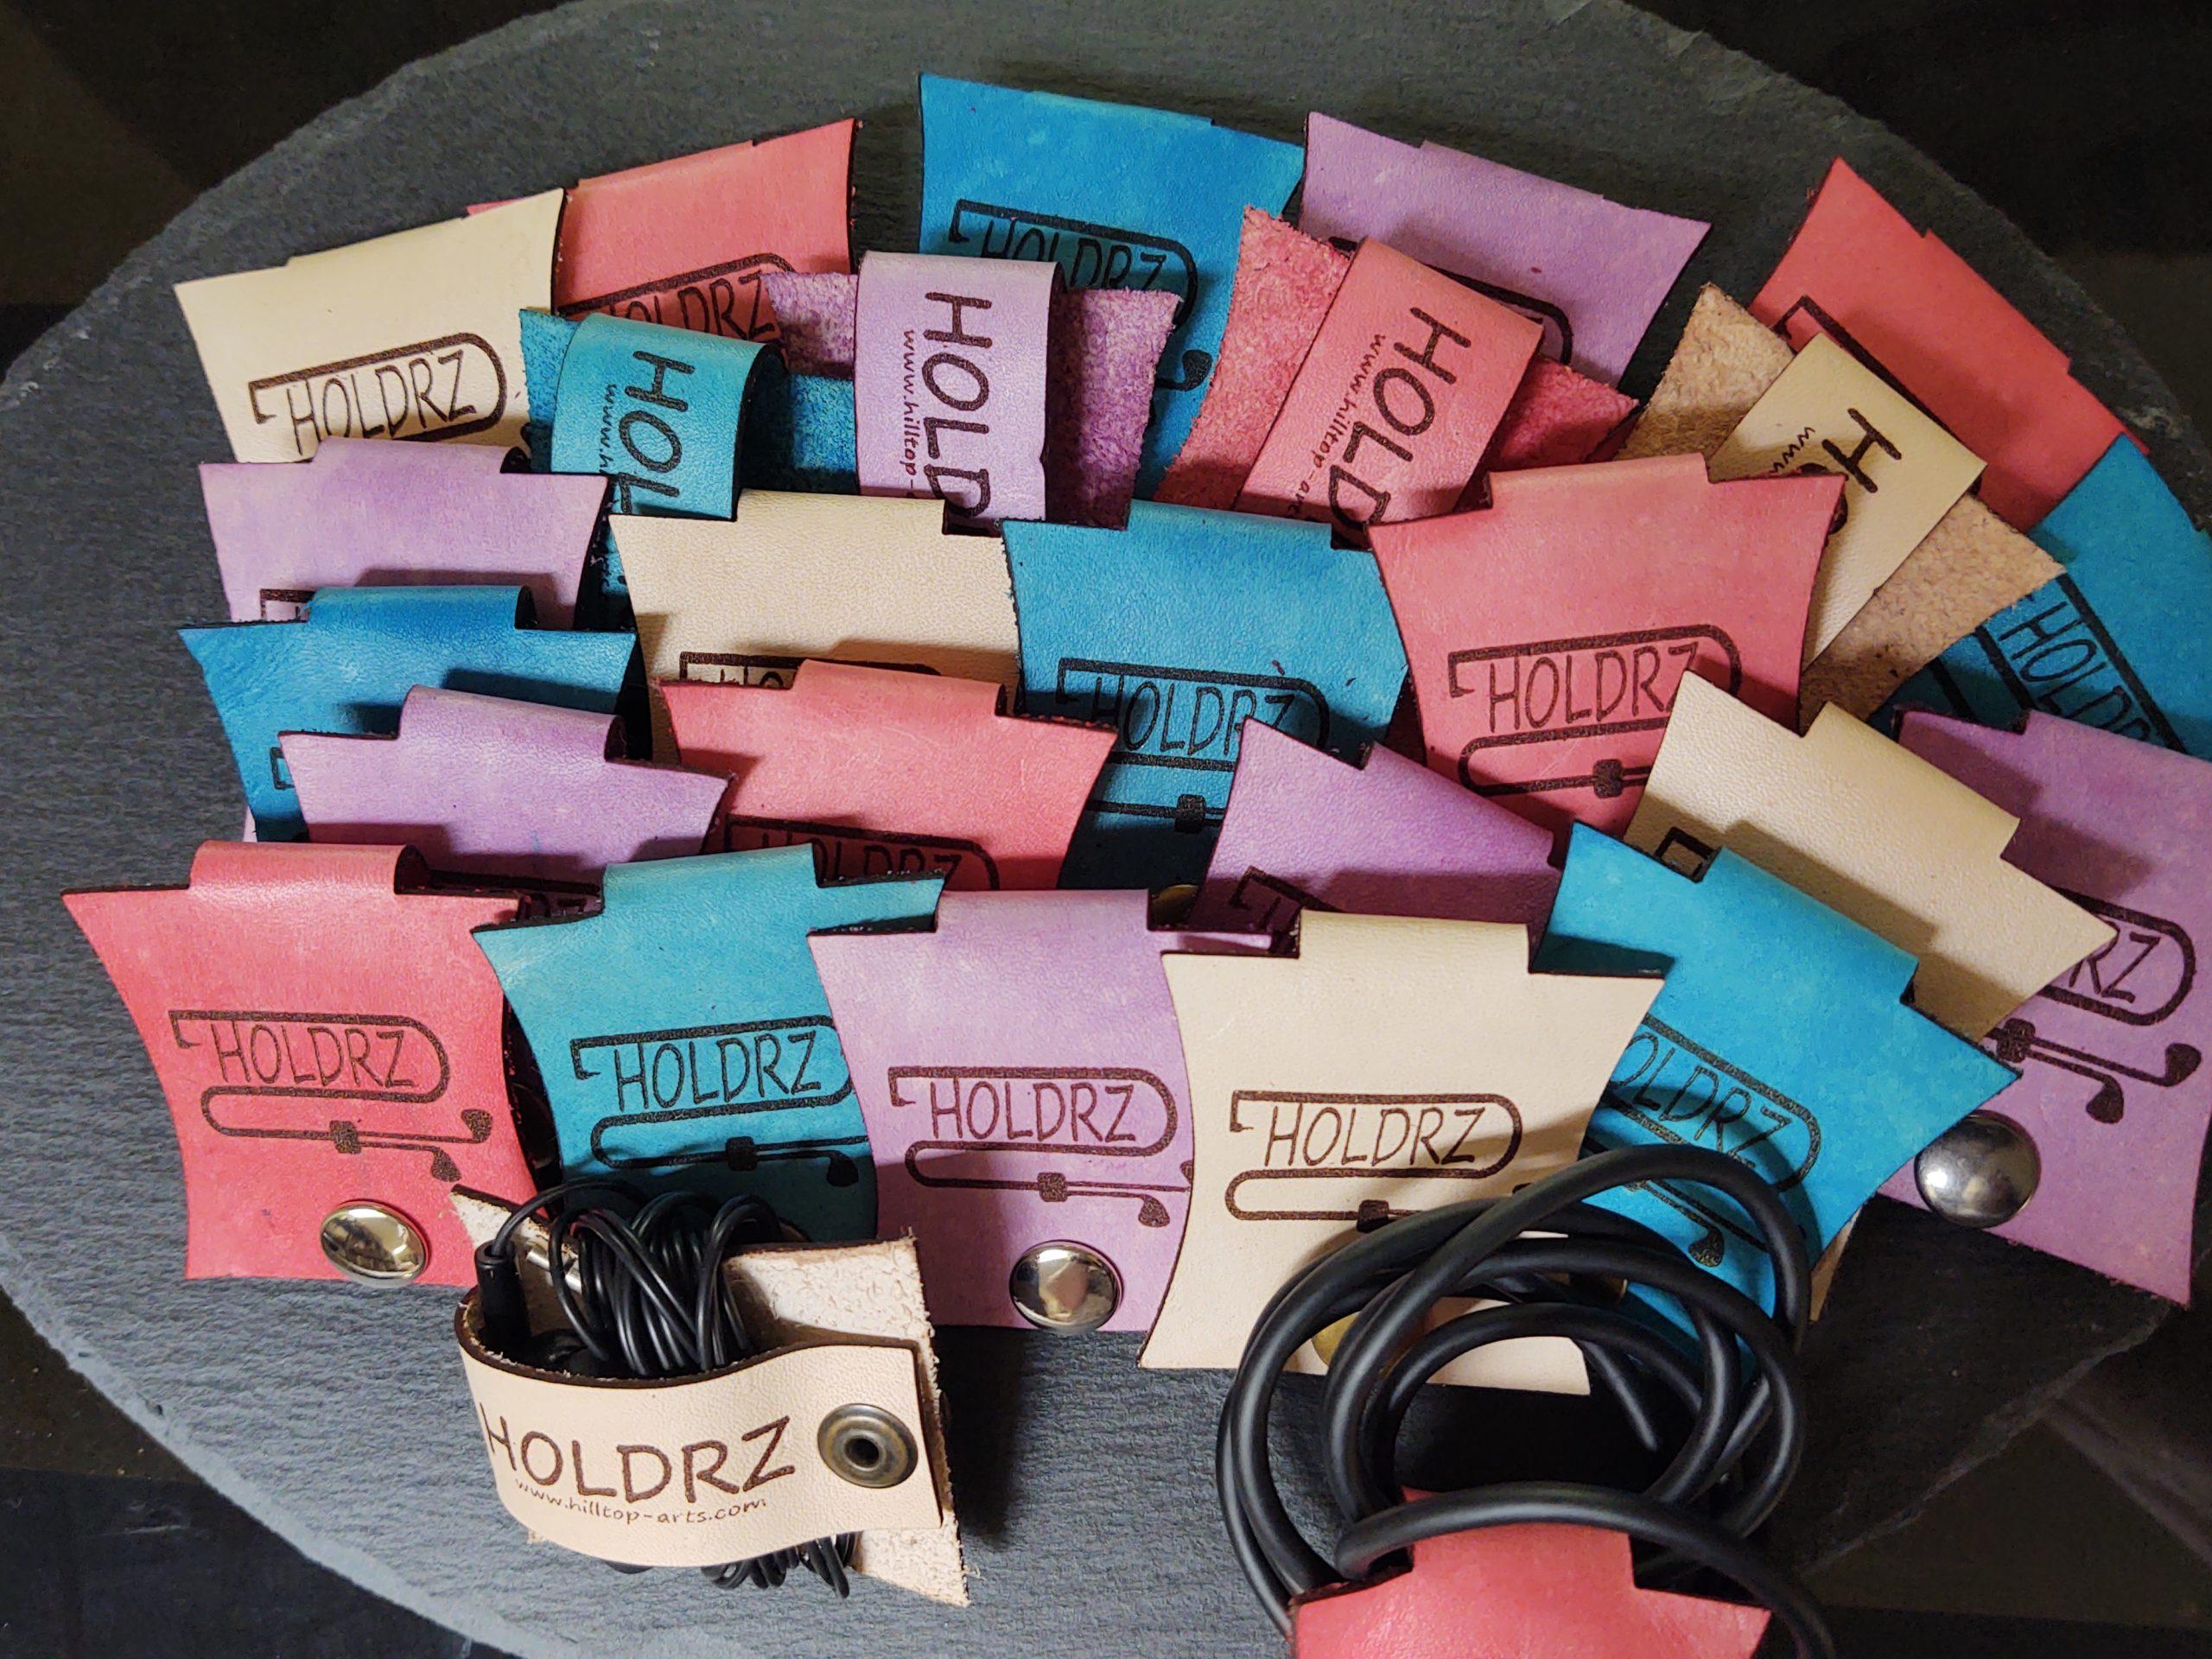 Holderz Cord & Earbud Wraps